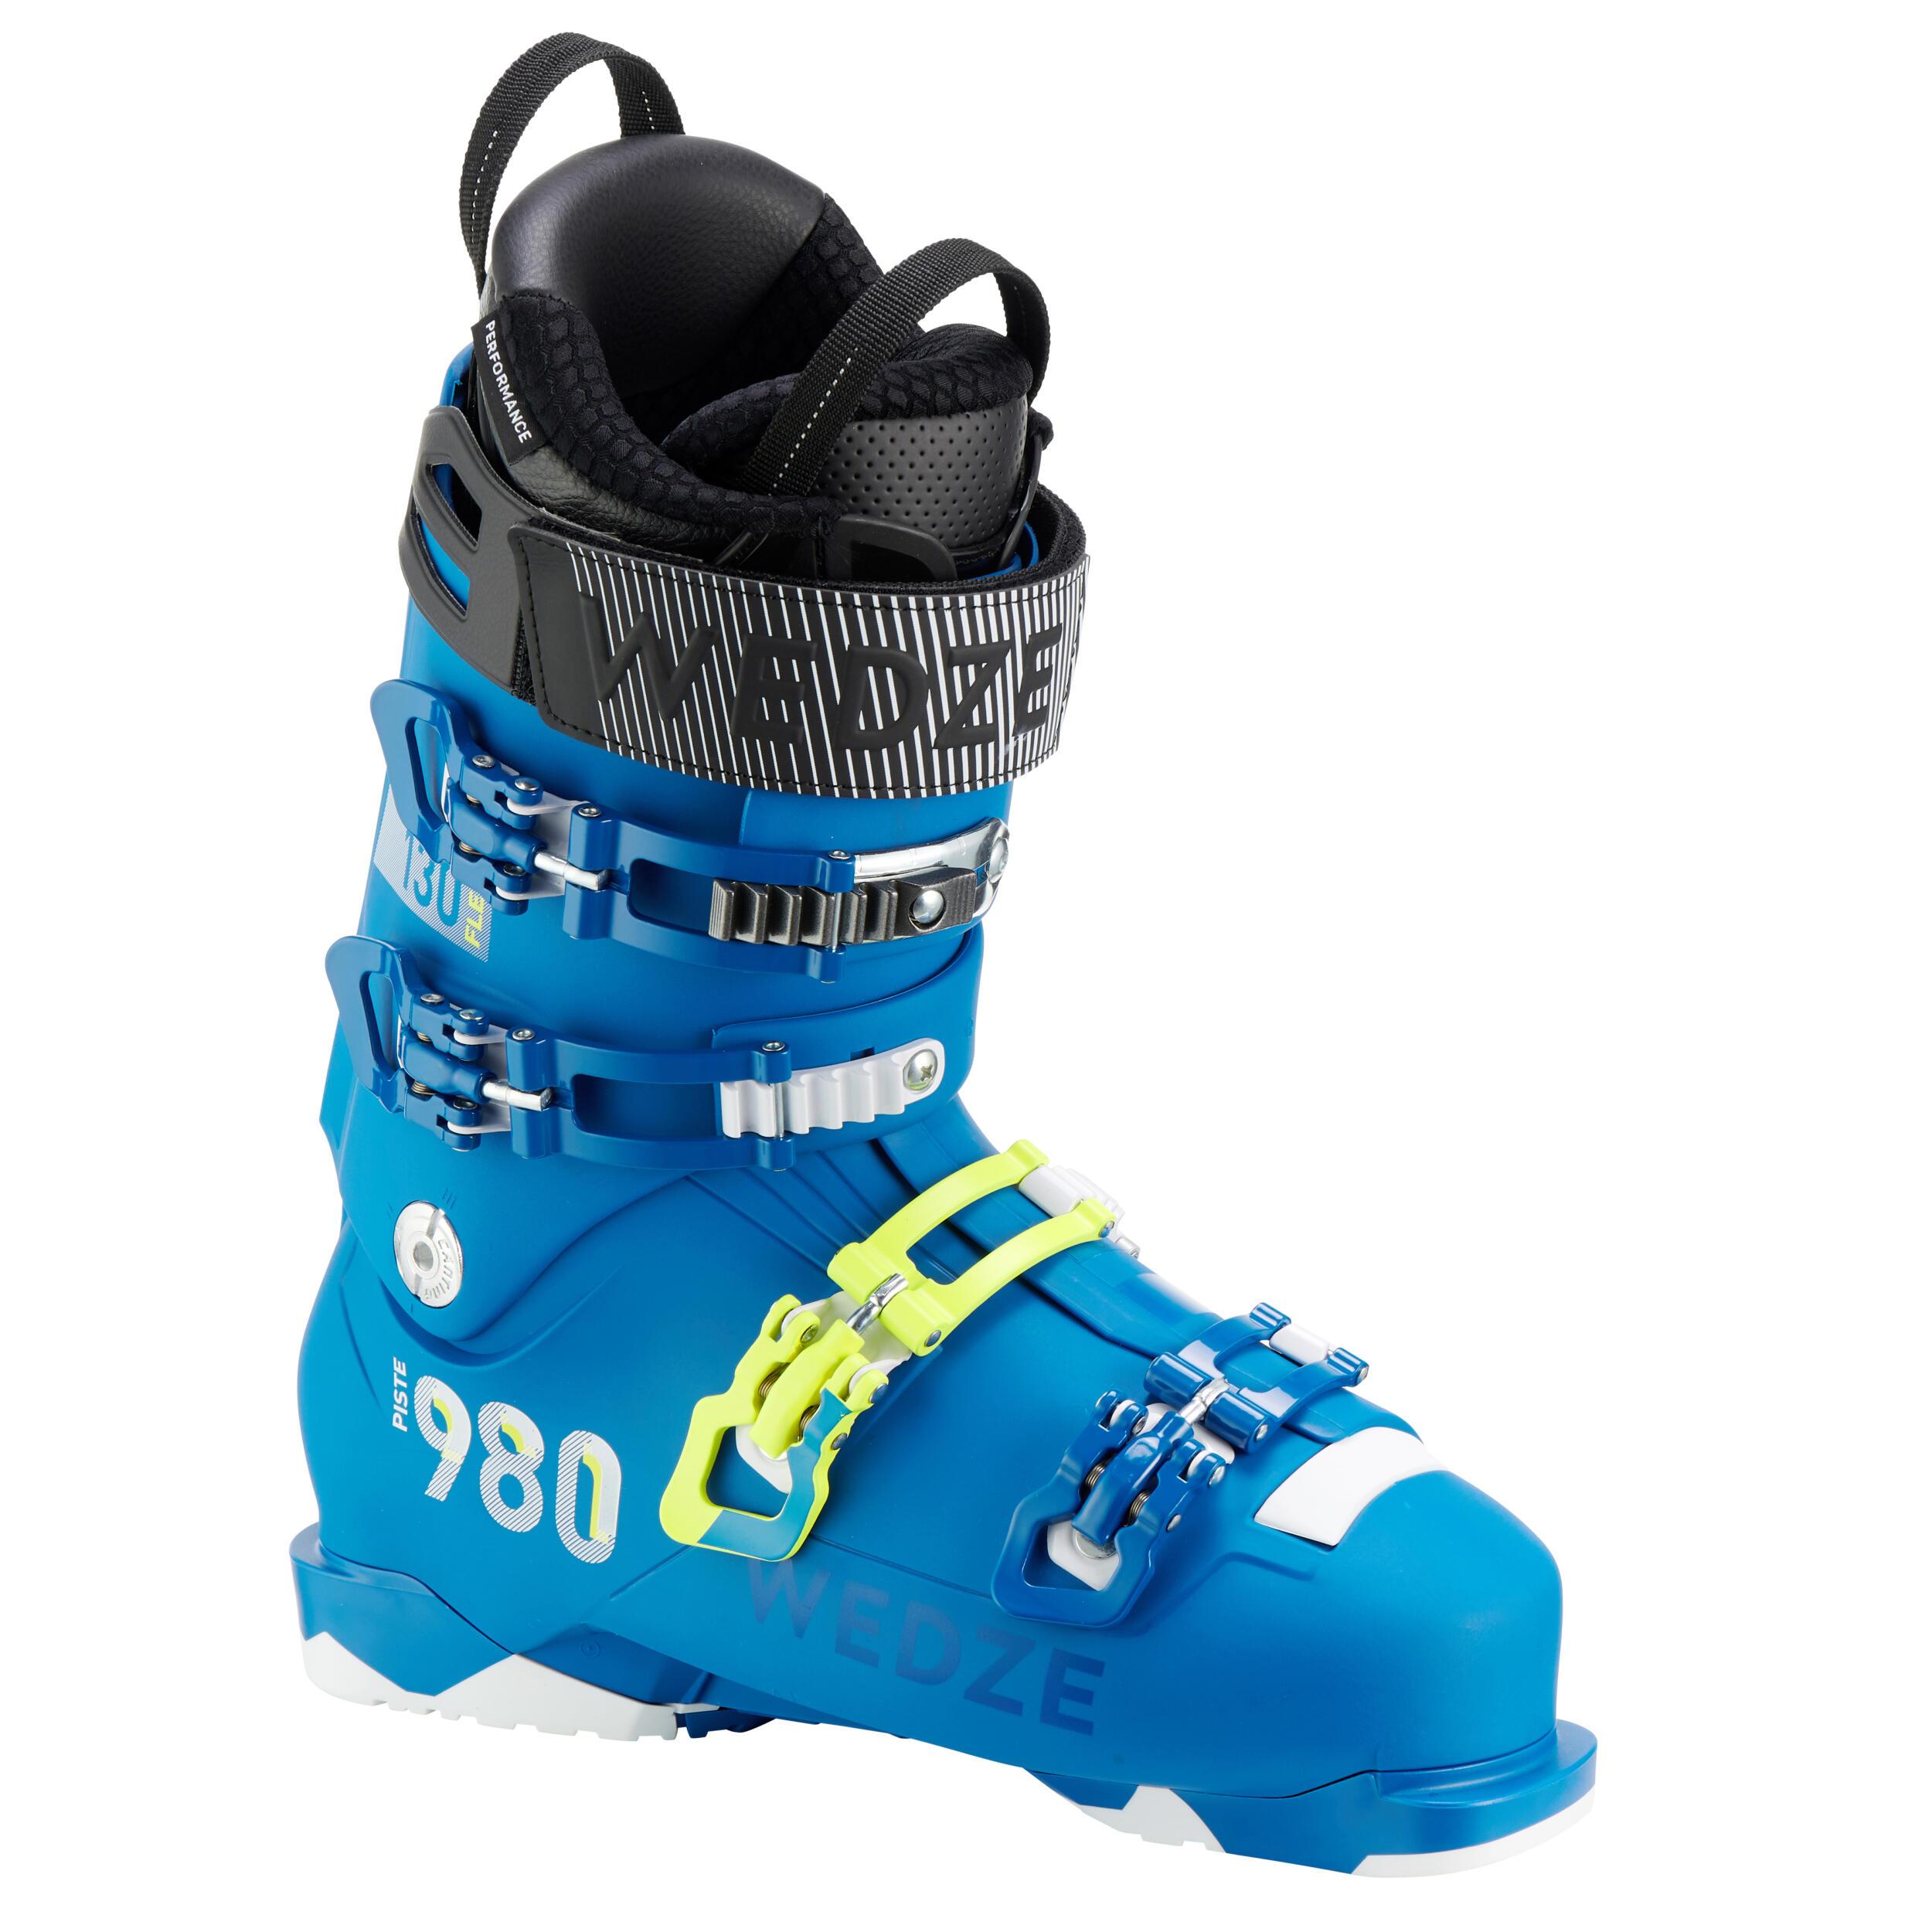 Botas Esqui Hombre Wedze Fit 980 Flex 130 Alpino Azul Wedze Black Friday Decathlon 2020